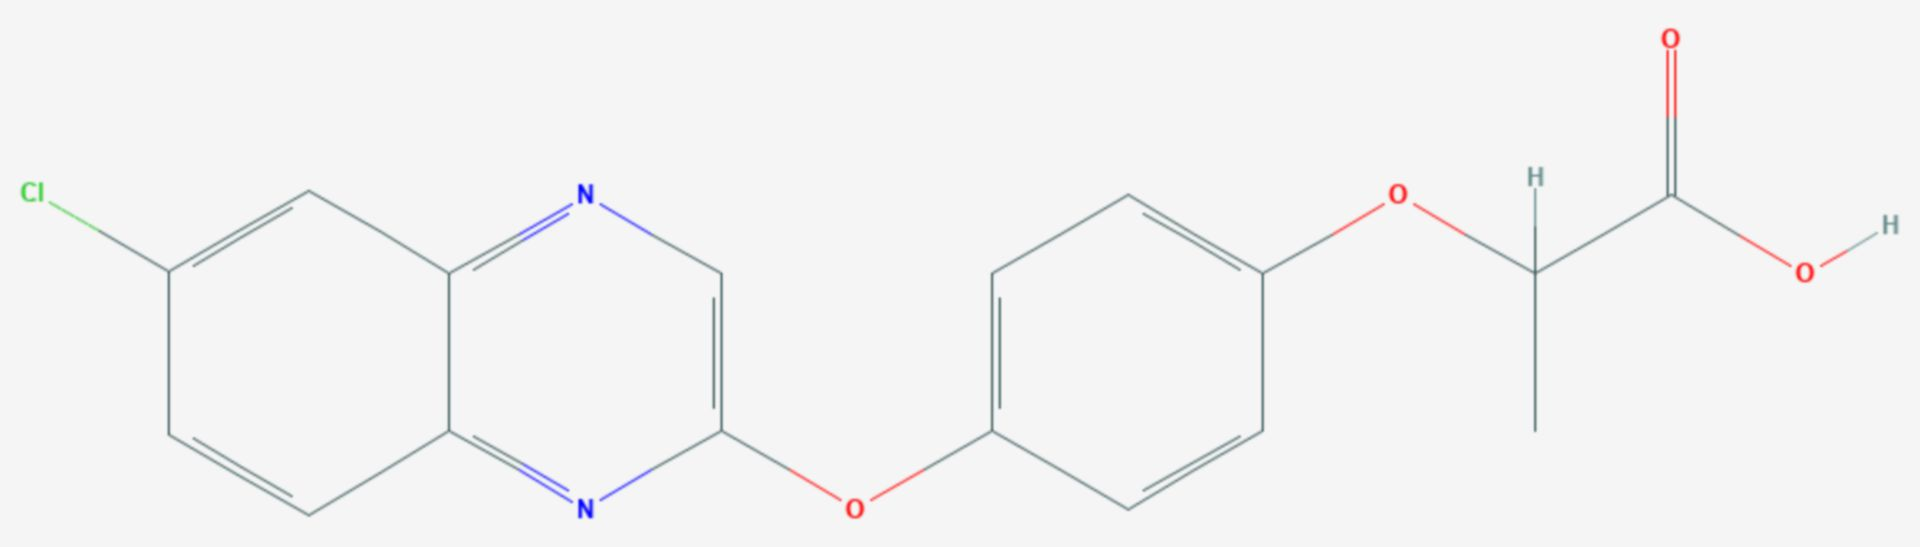 Quizalofop (Strukturformel)